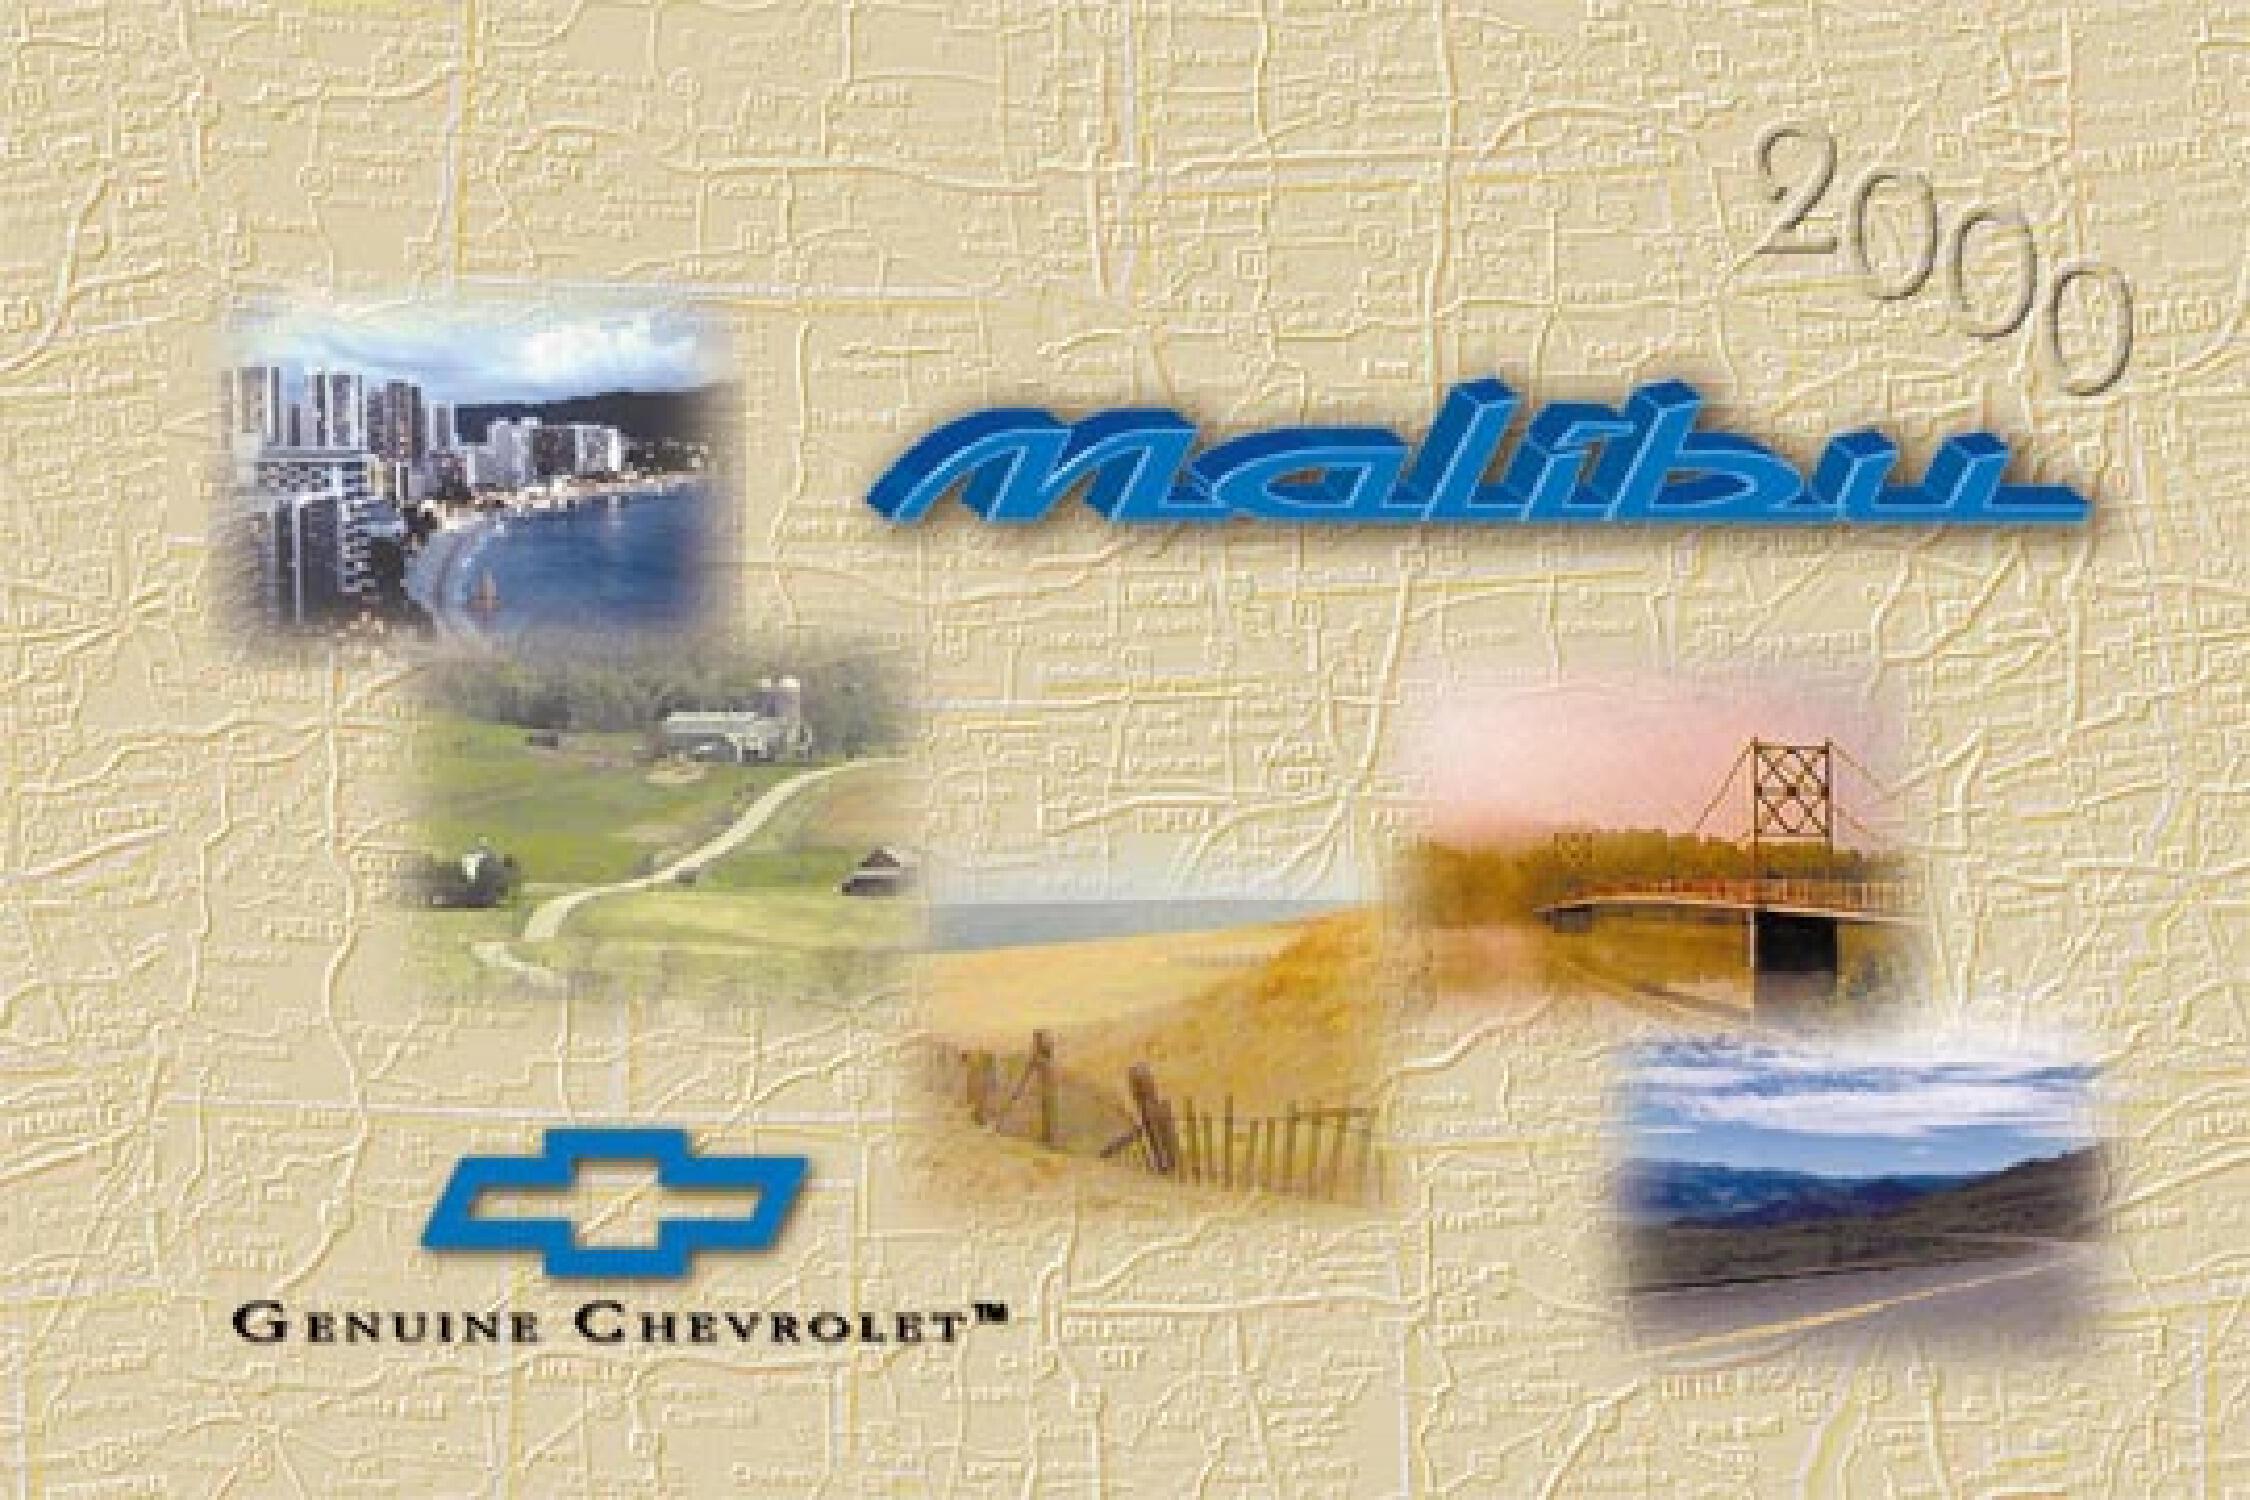 2000 Chevrolet Malibu owners manual